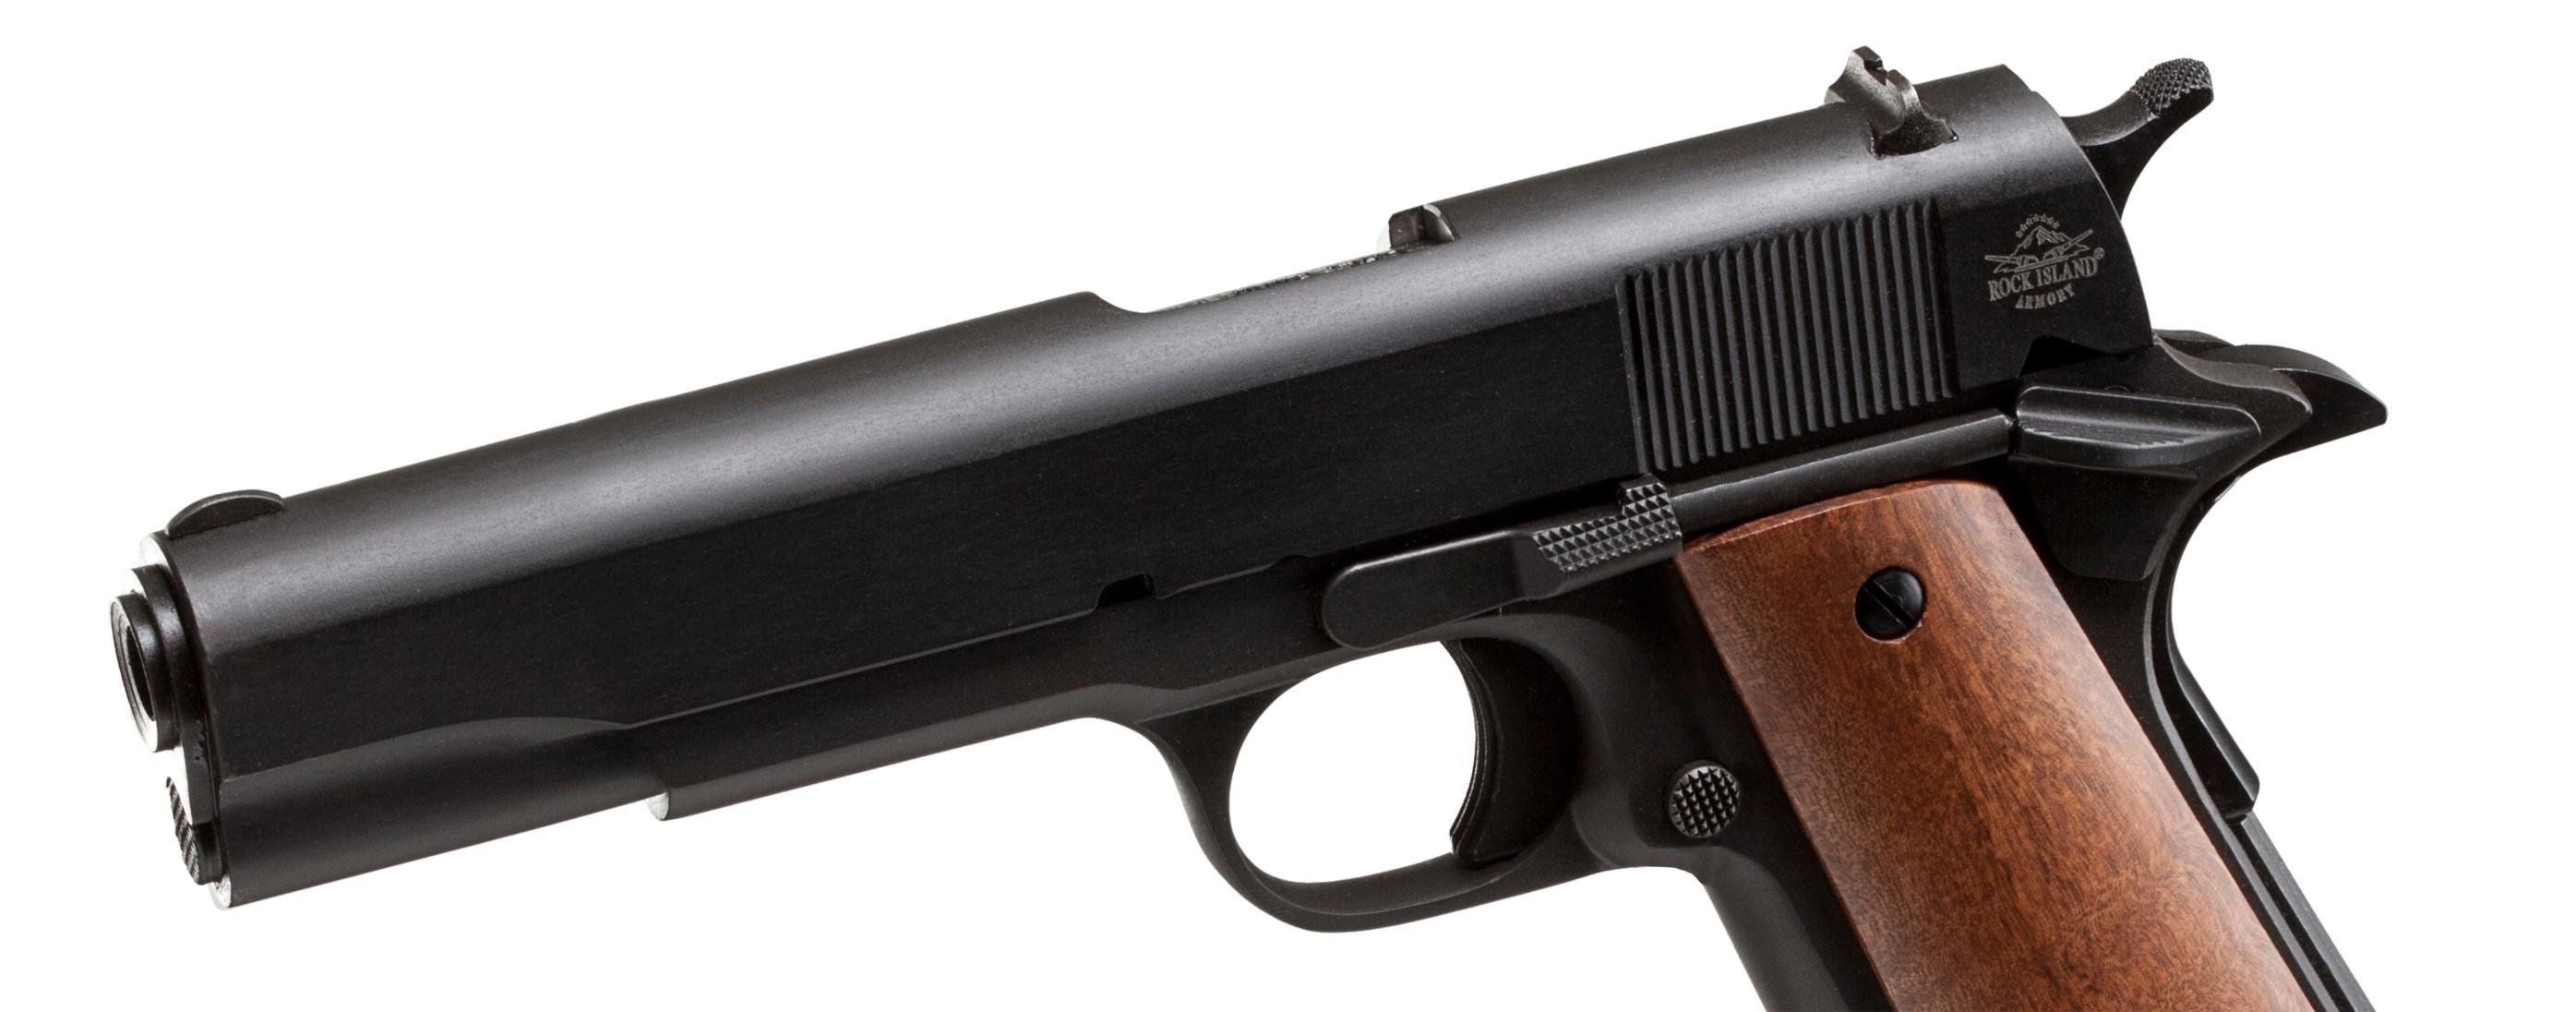 51615_1911-A1_GI-Standard_FS_9mm_White.jpg